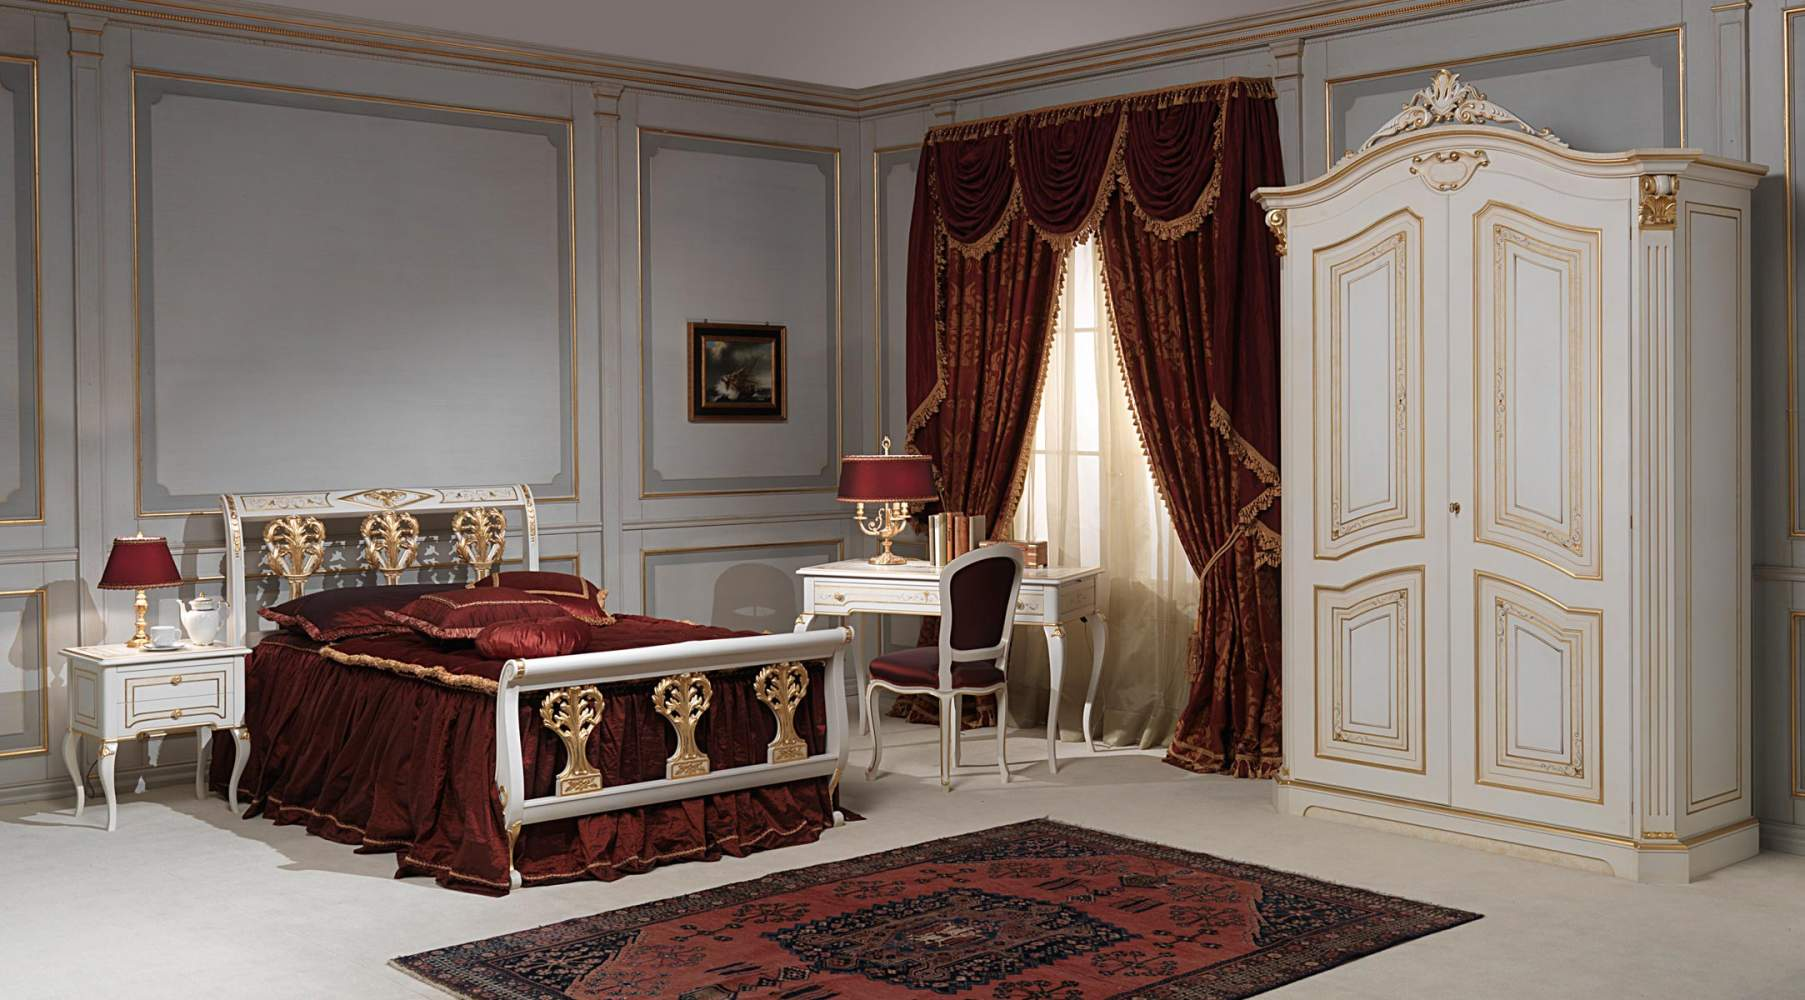 French Bedroom 18th Century Rubens Vimercati Classic